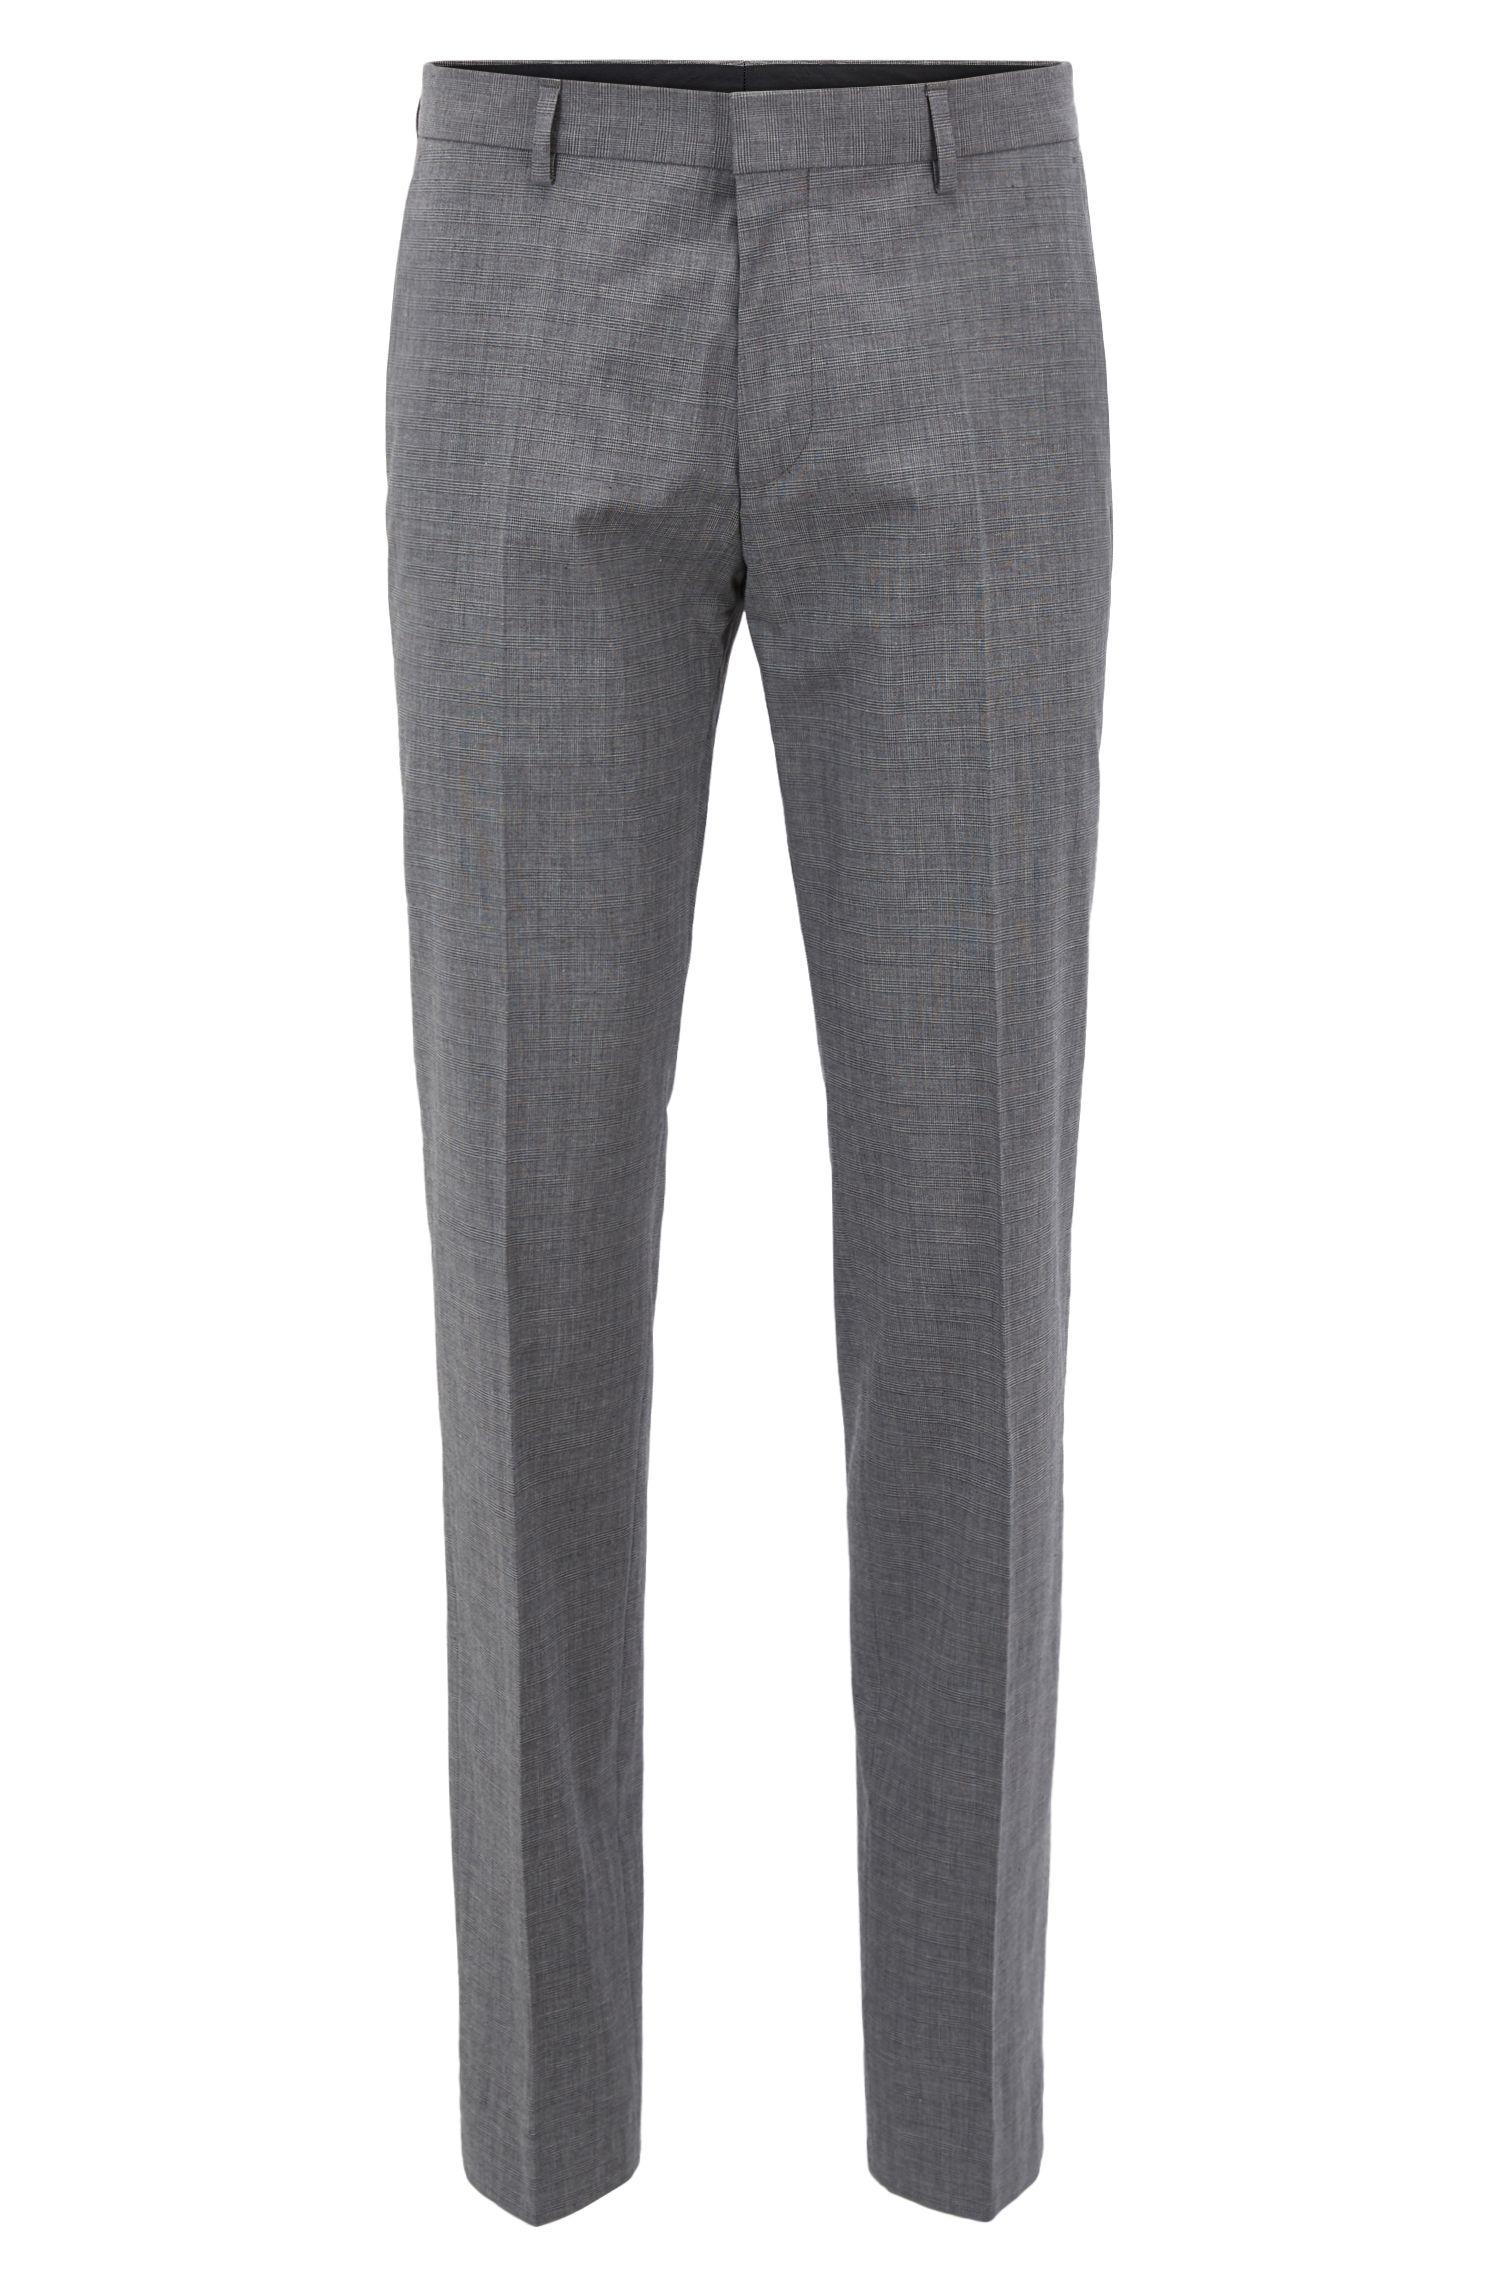 Slim-fit trousers in melange stretch cotton, Grigio